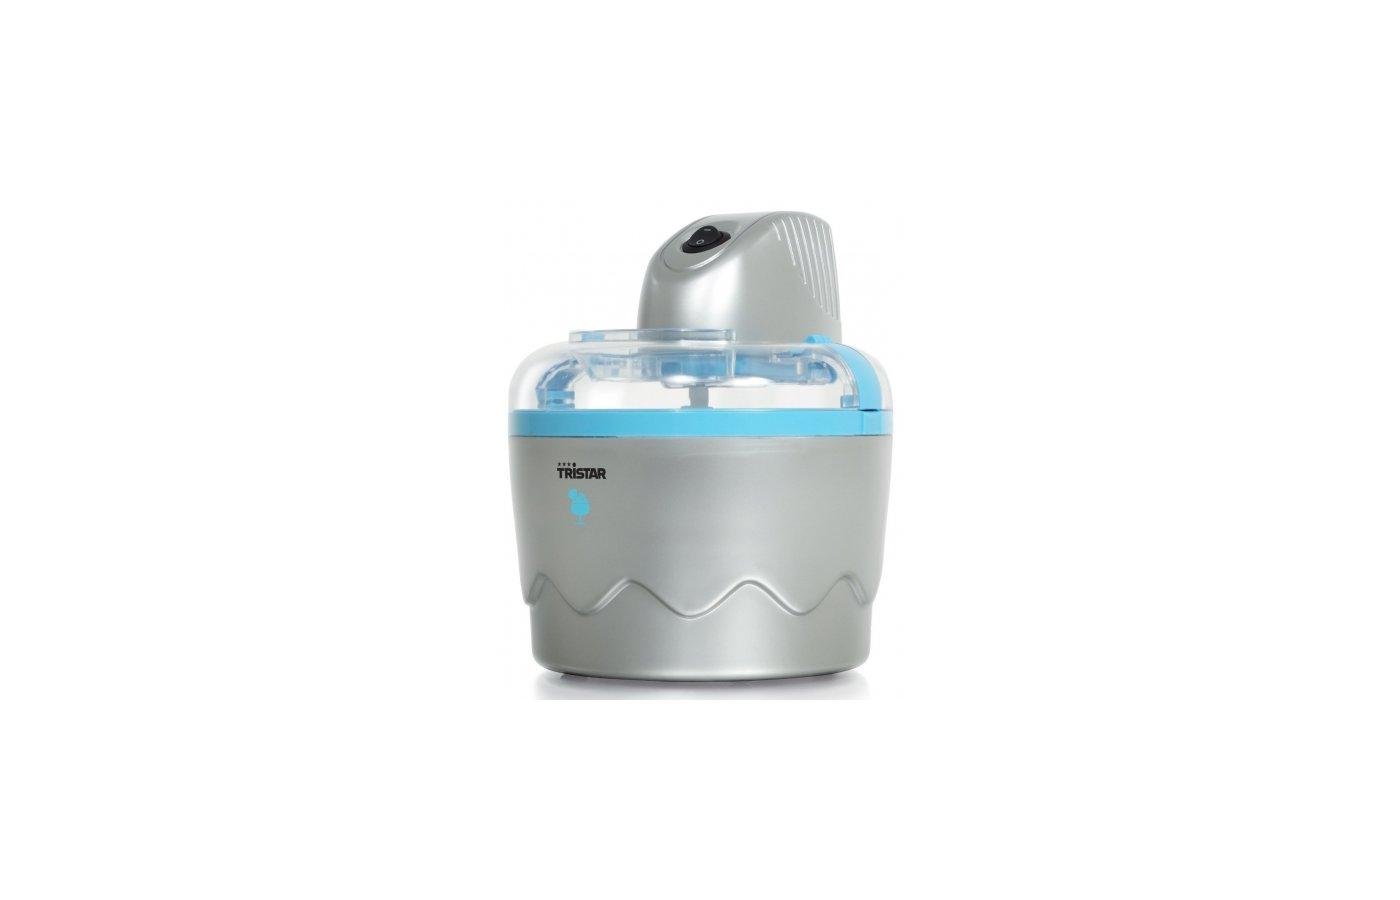 Мороженицы TRISTAR YM-2603 мороженица